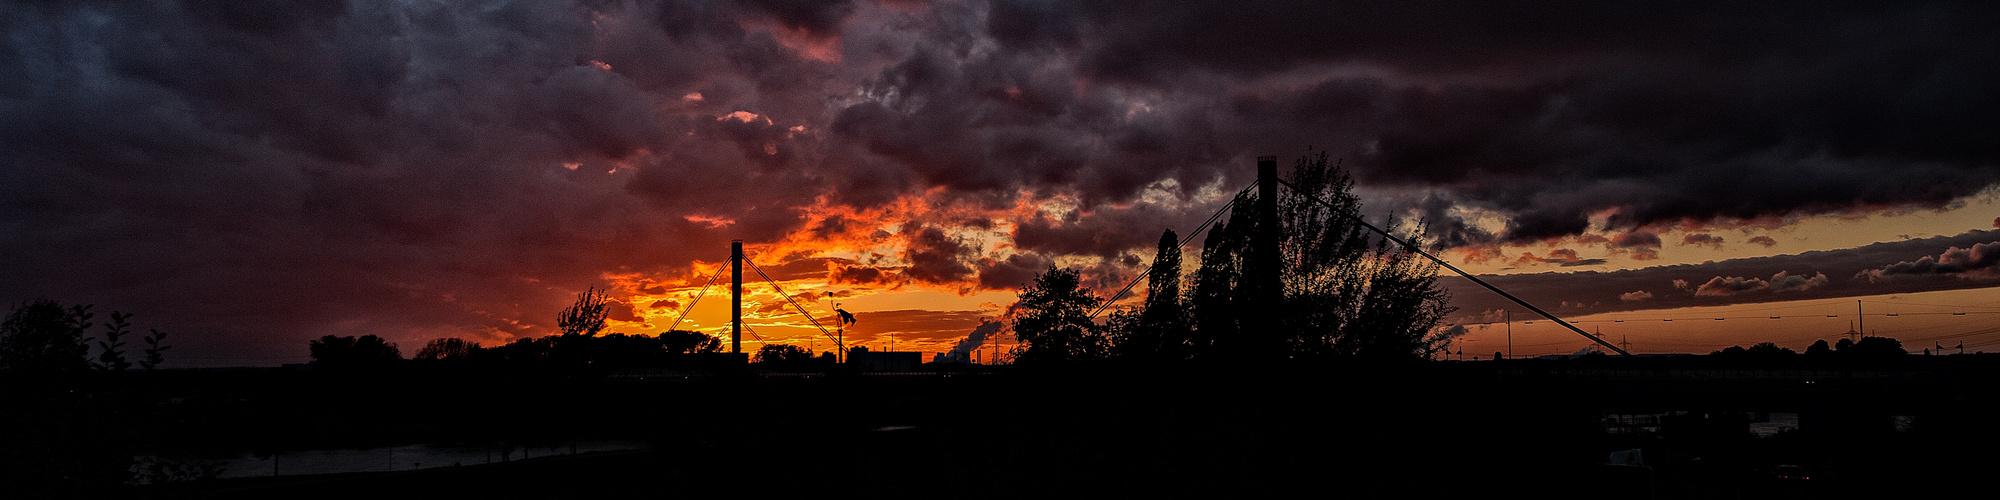 Sunset in Leverkusen